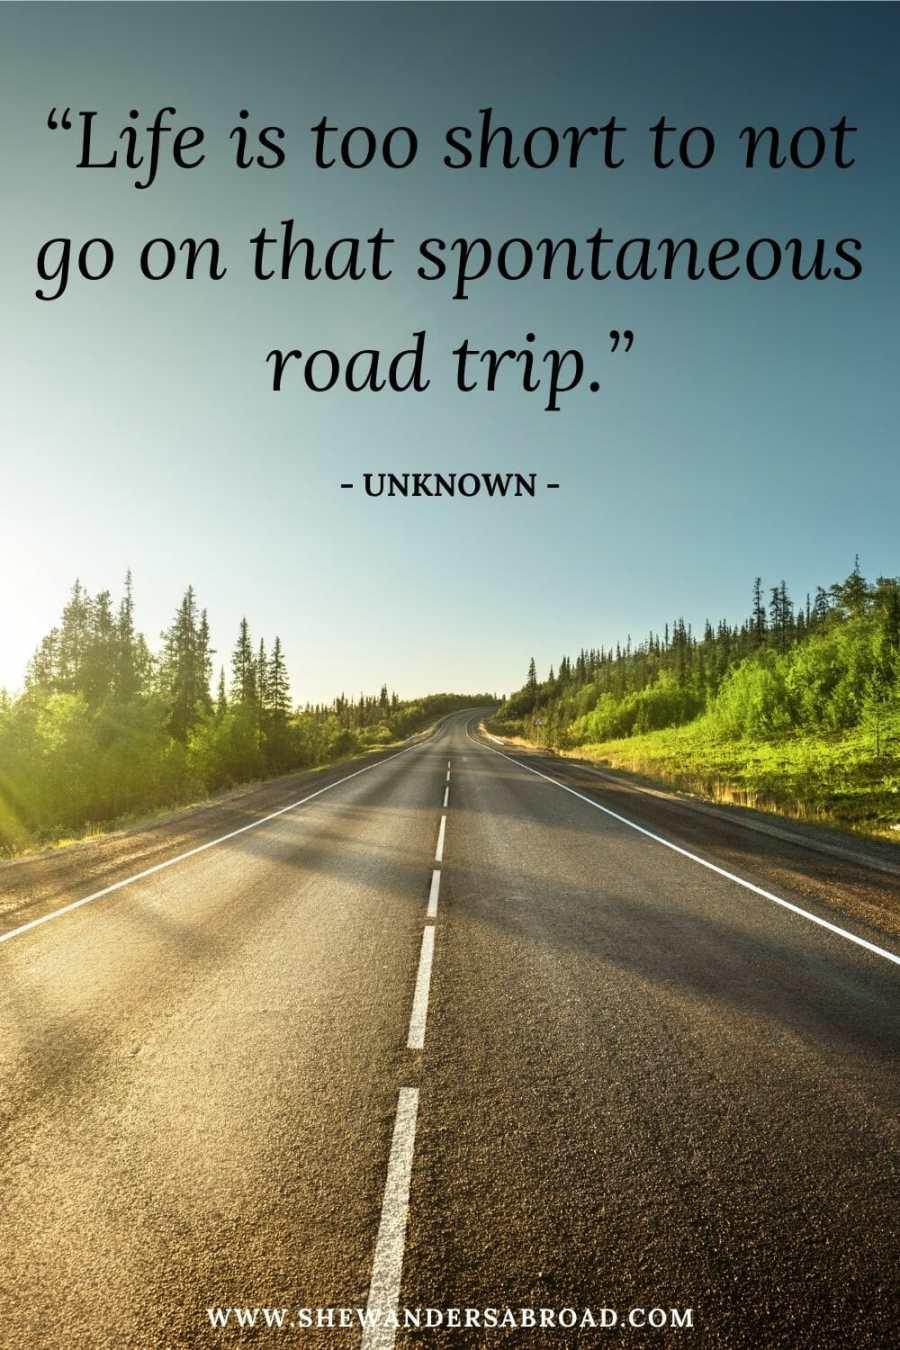 Short road trip captions for Instagram